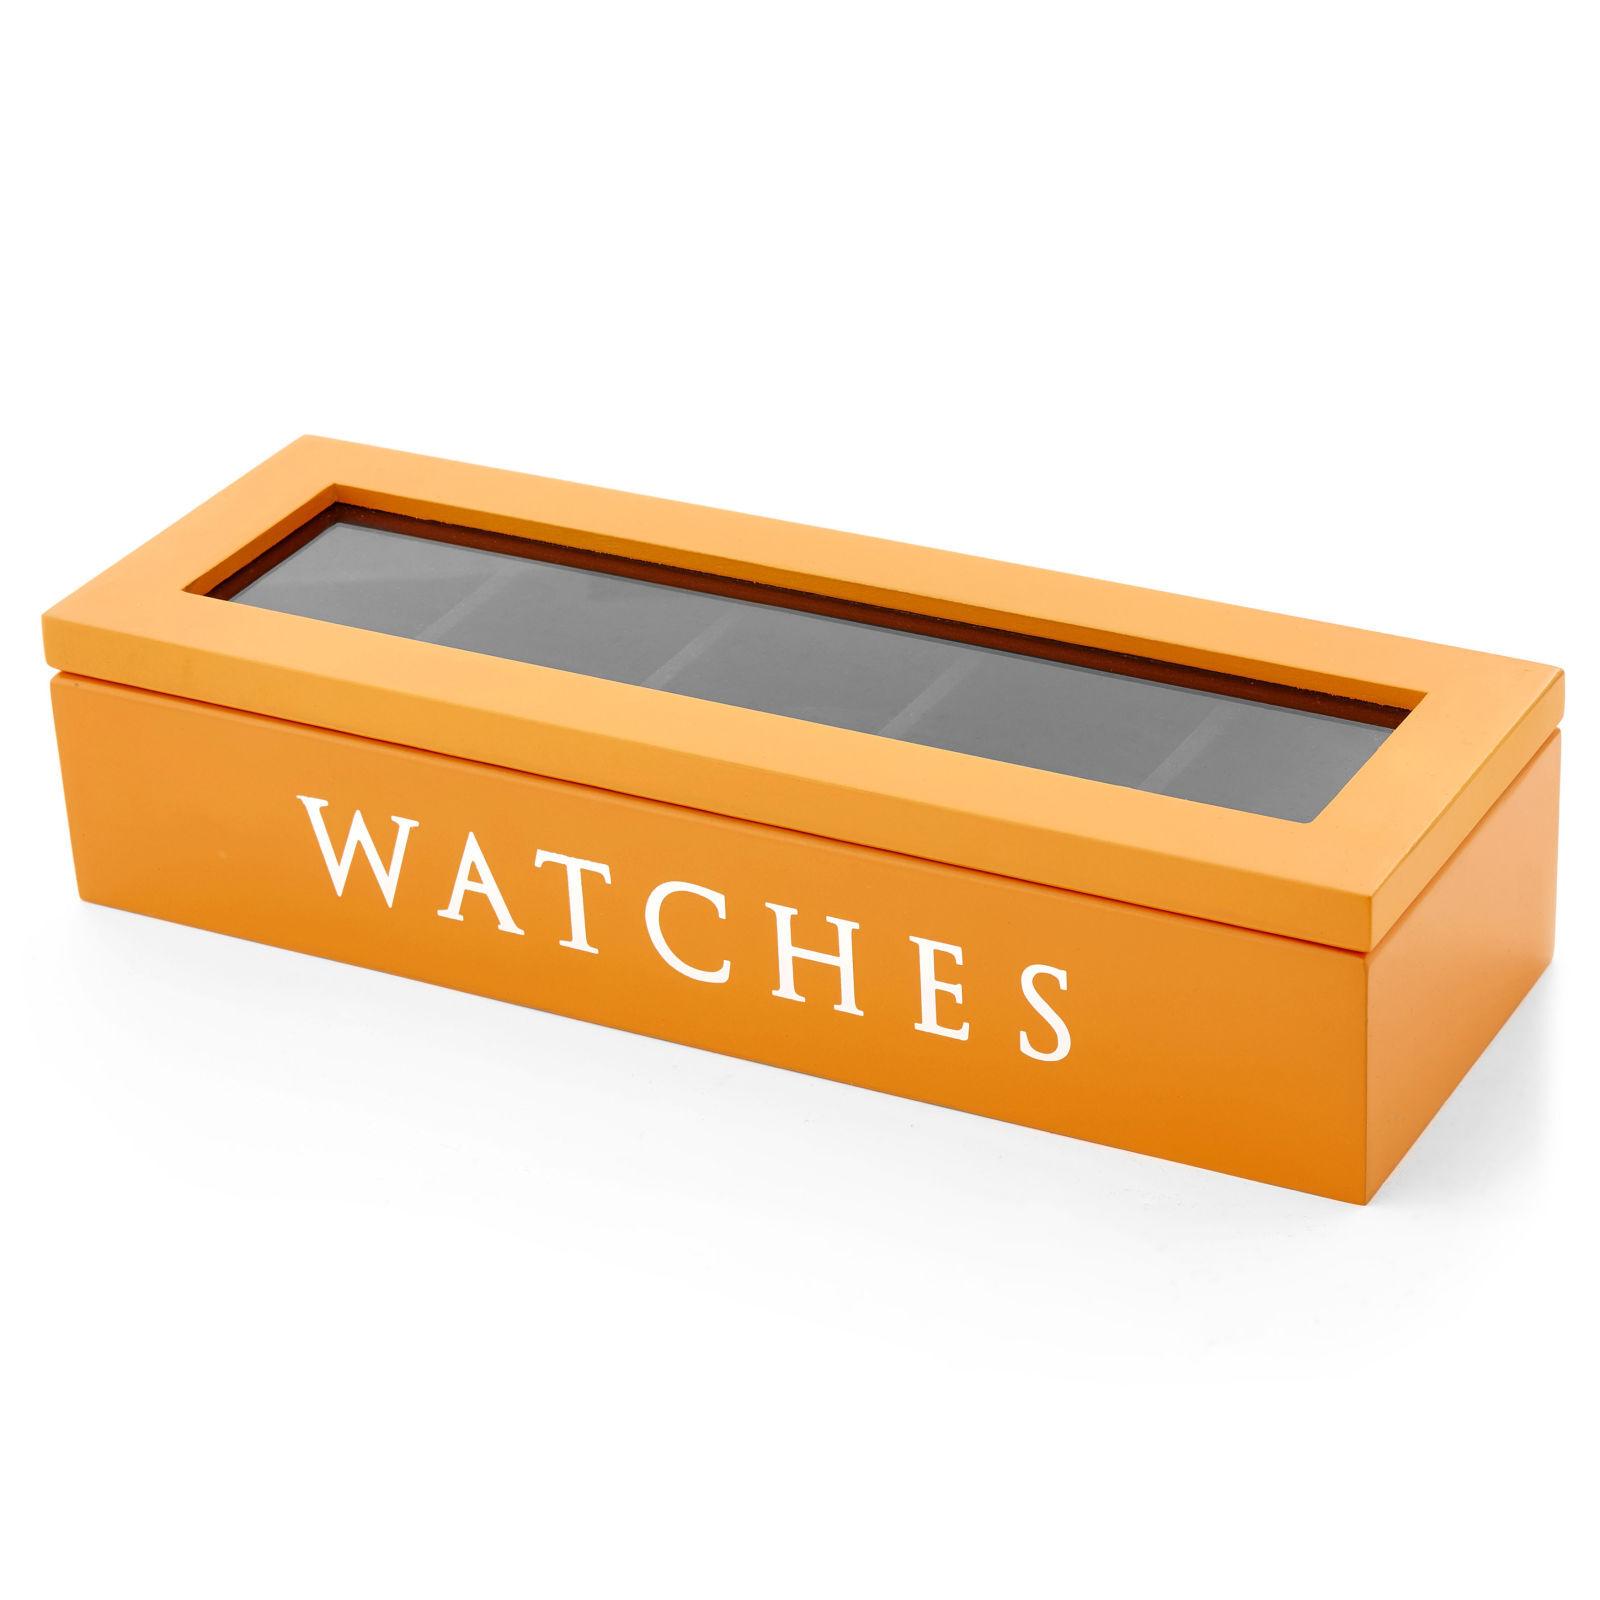 Warren Asher Oranssi puinen kellolaatikko - 5 kellolle